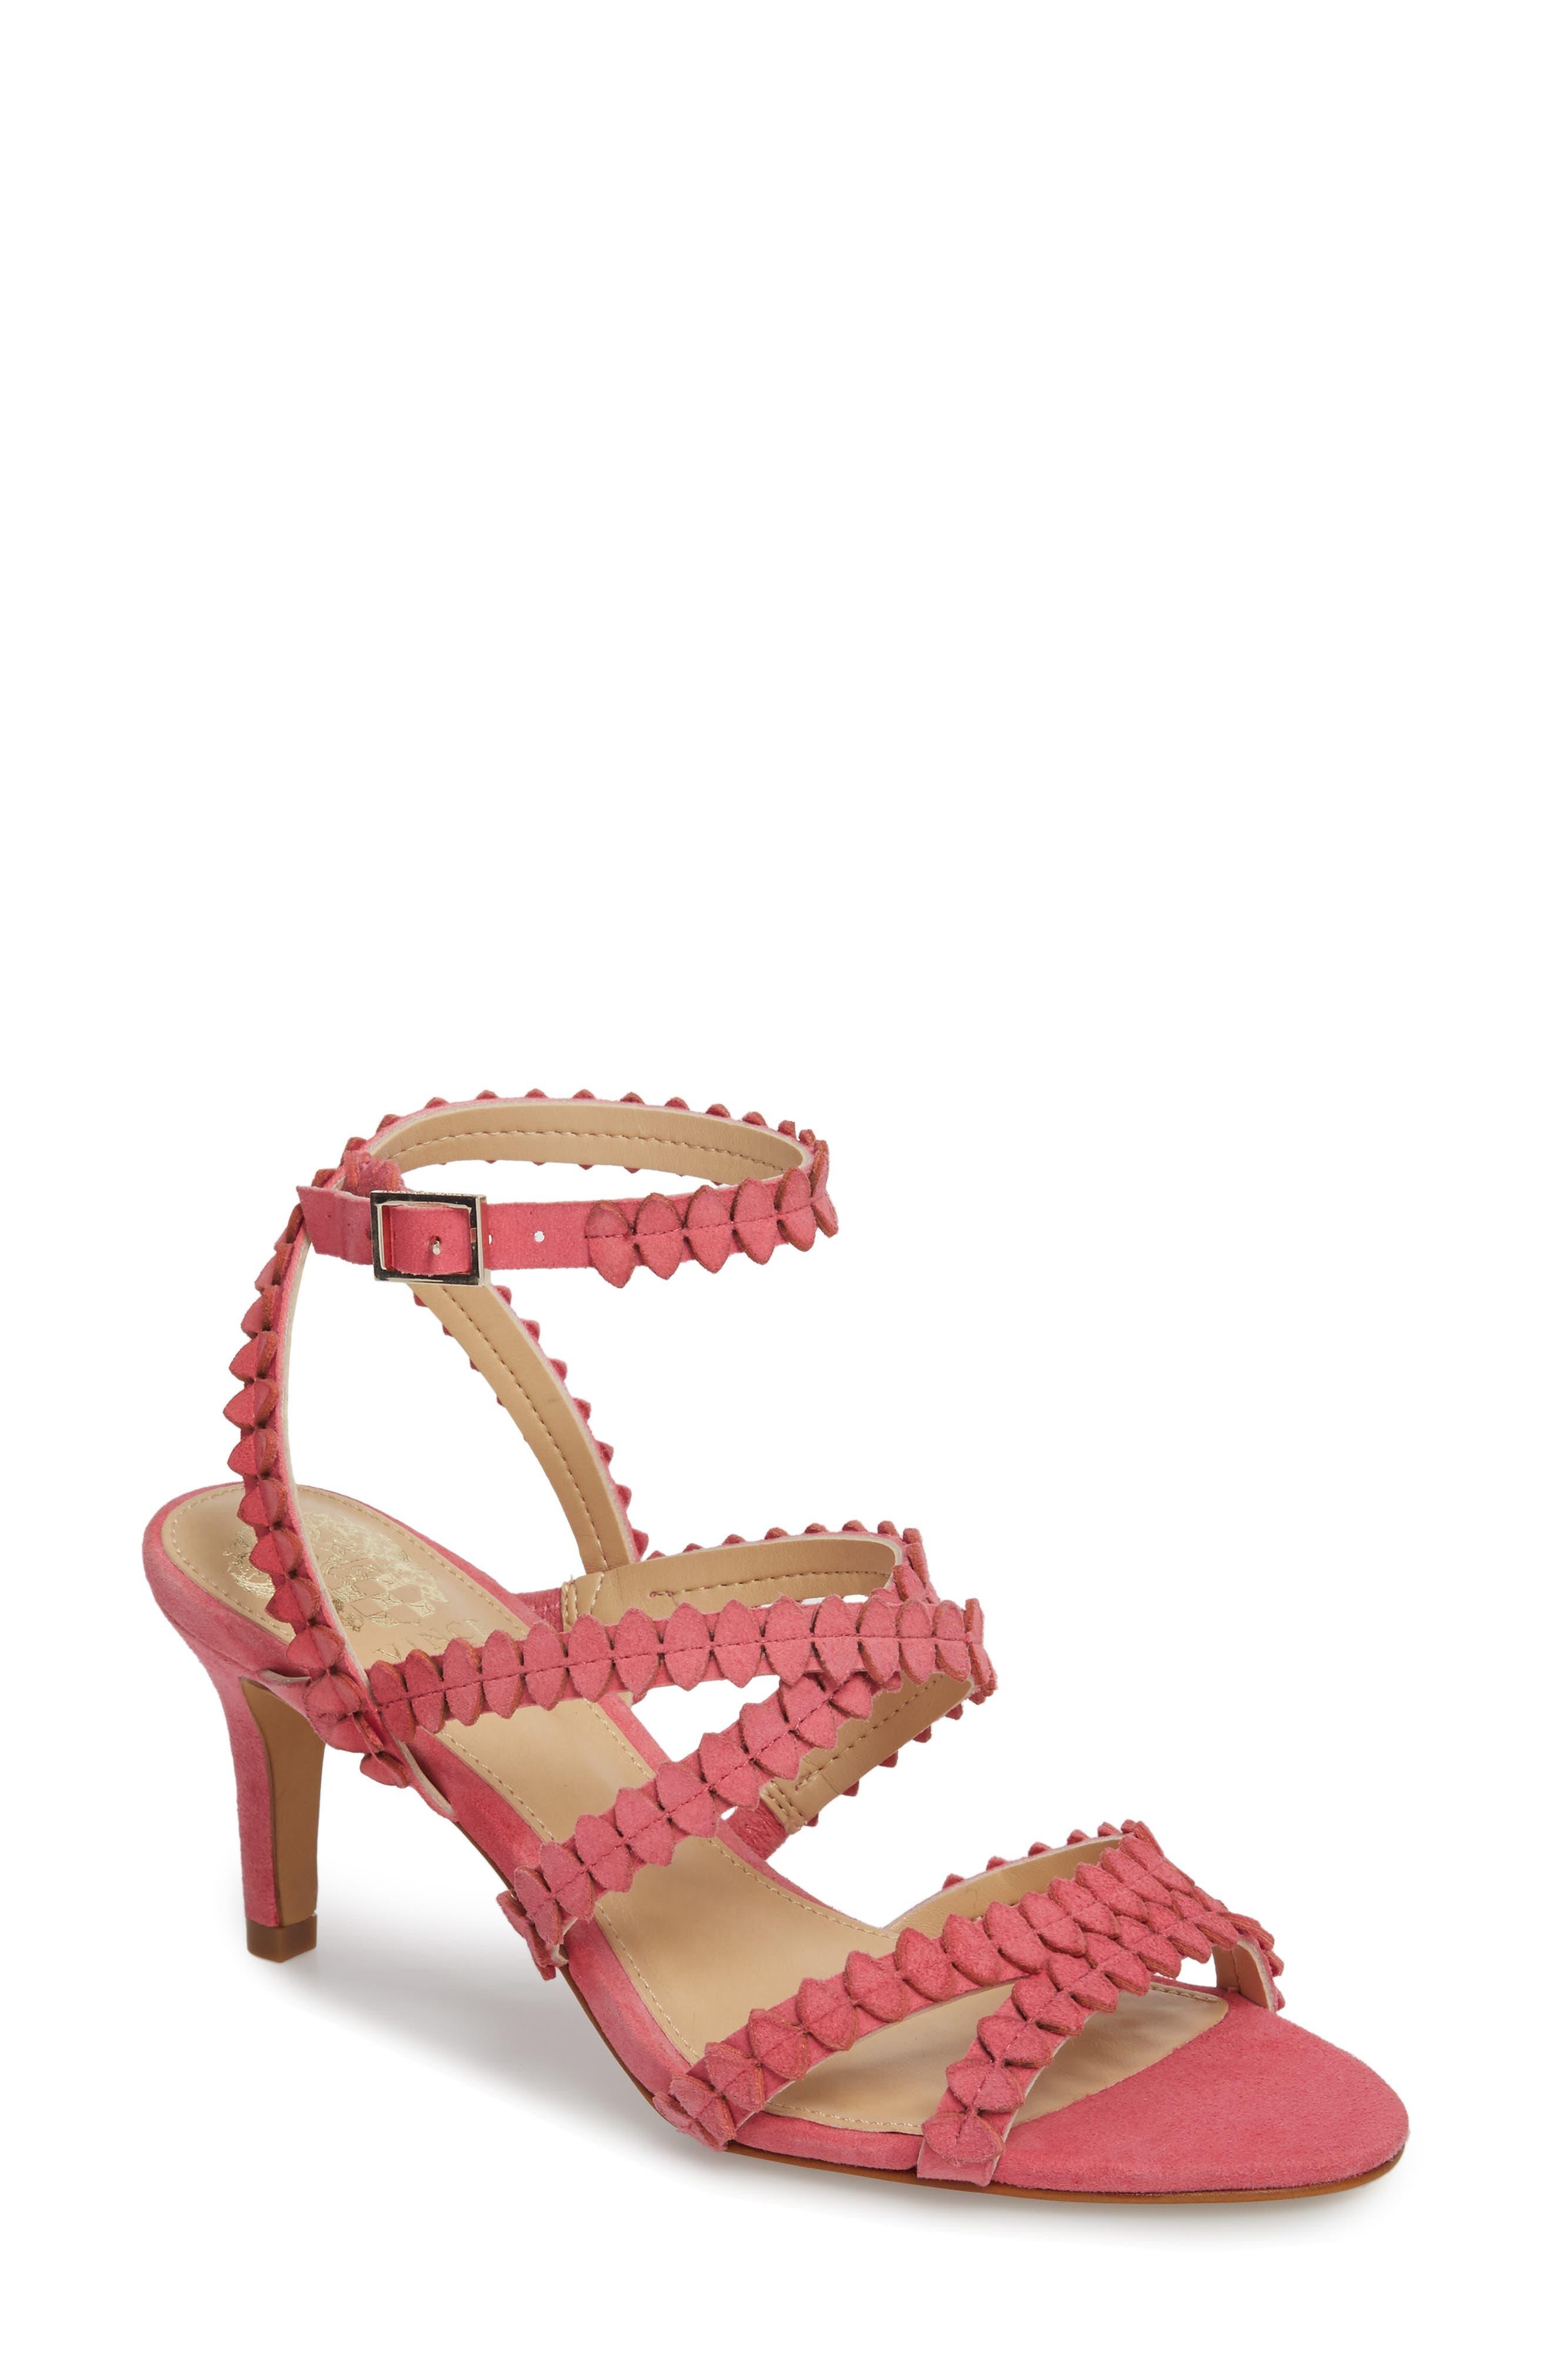 Yuria Sandal,                         Main,                         color, Soft Pink Suede